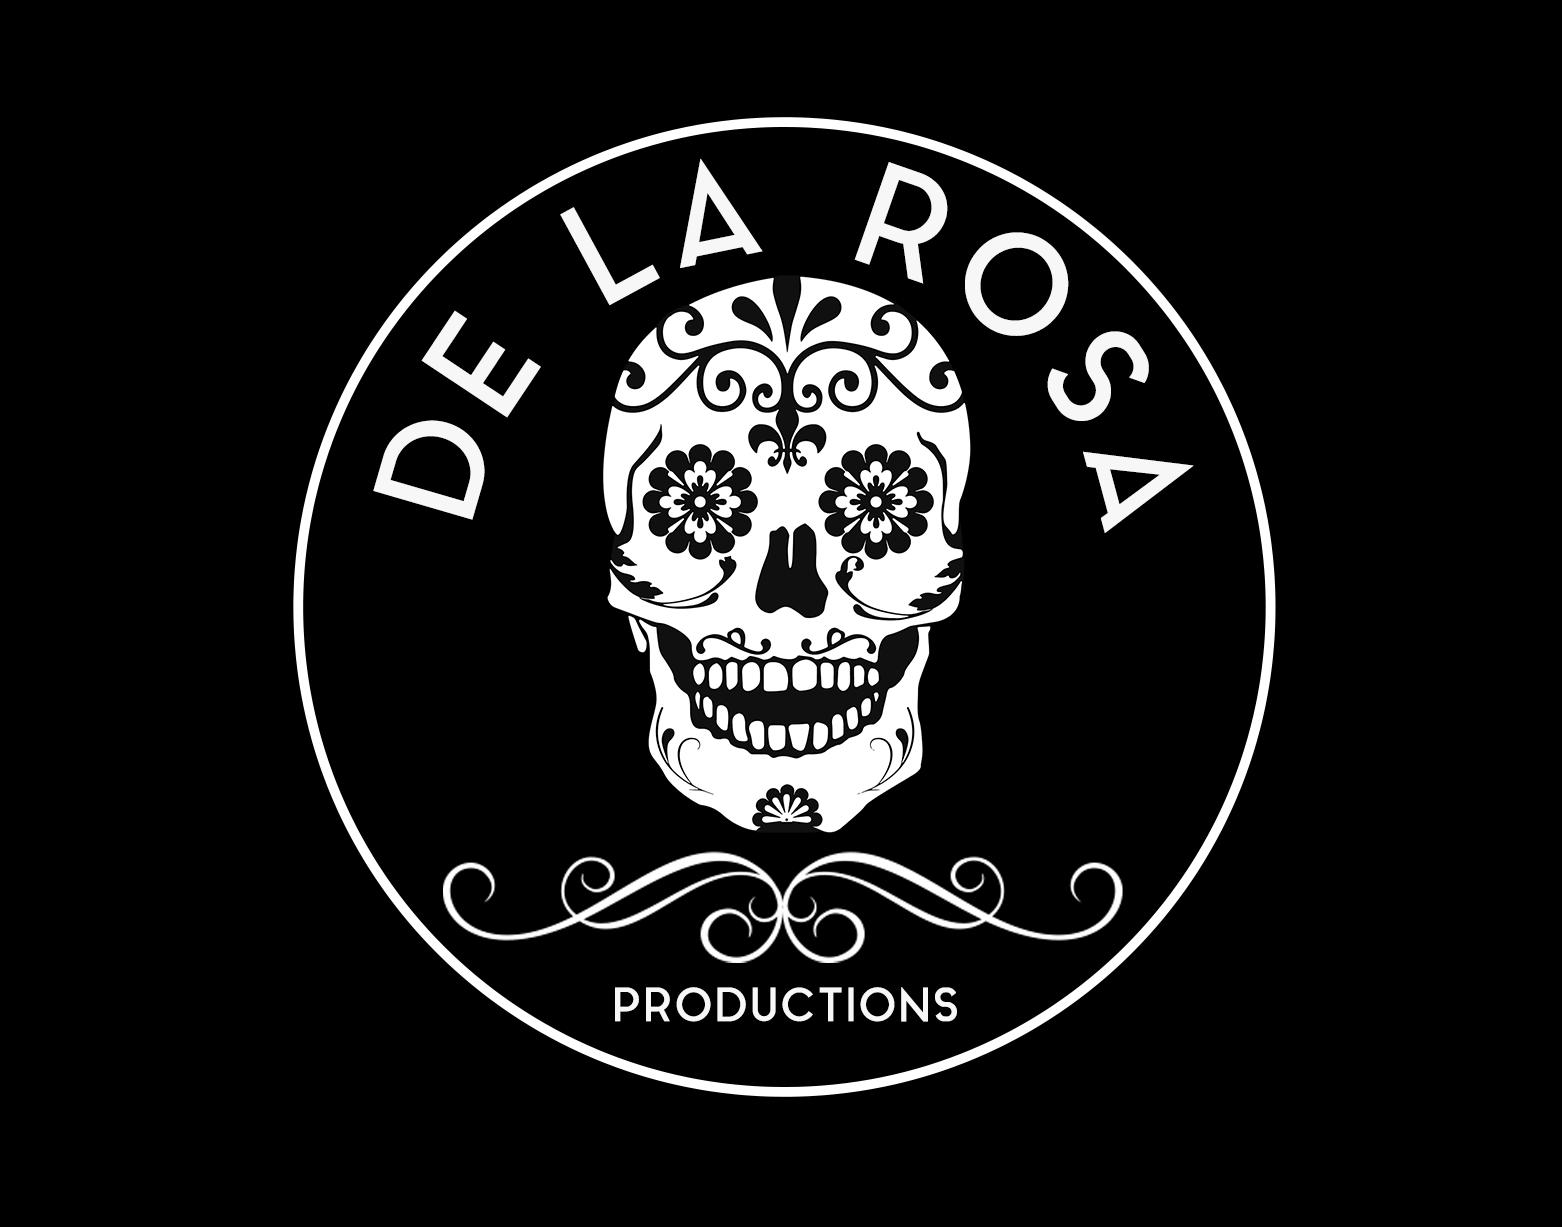 cropped-de-la-rosa-logo.png